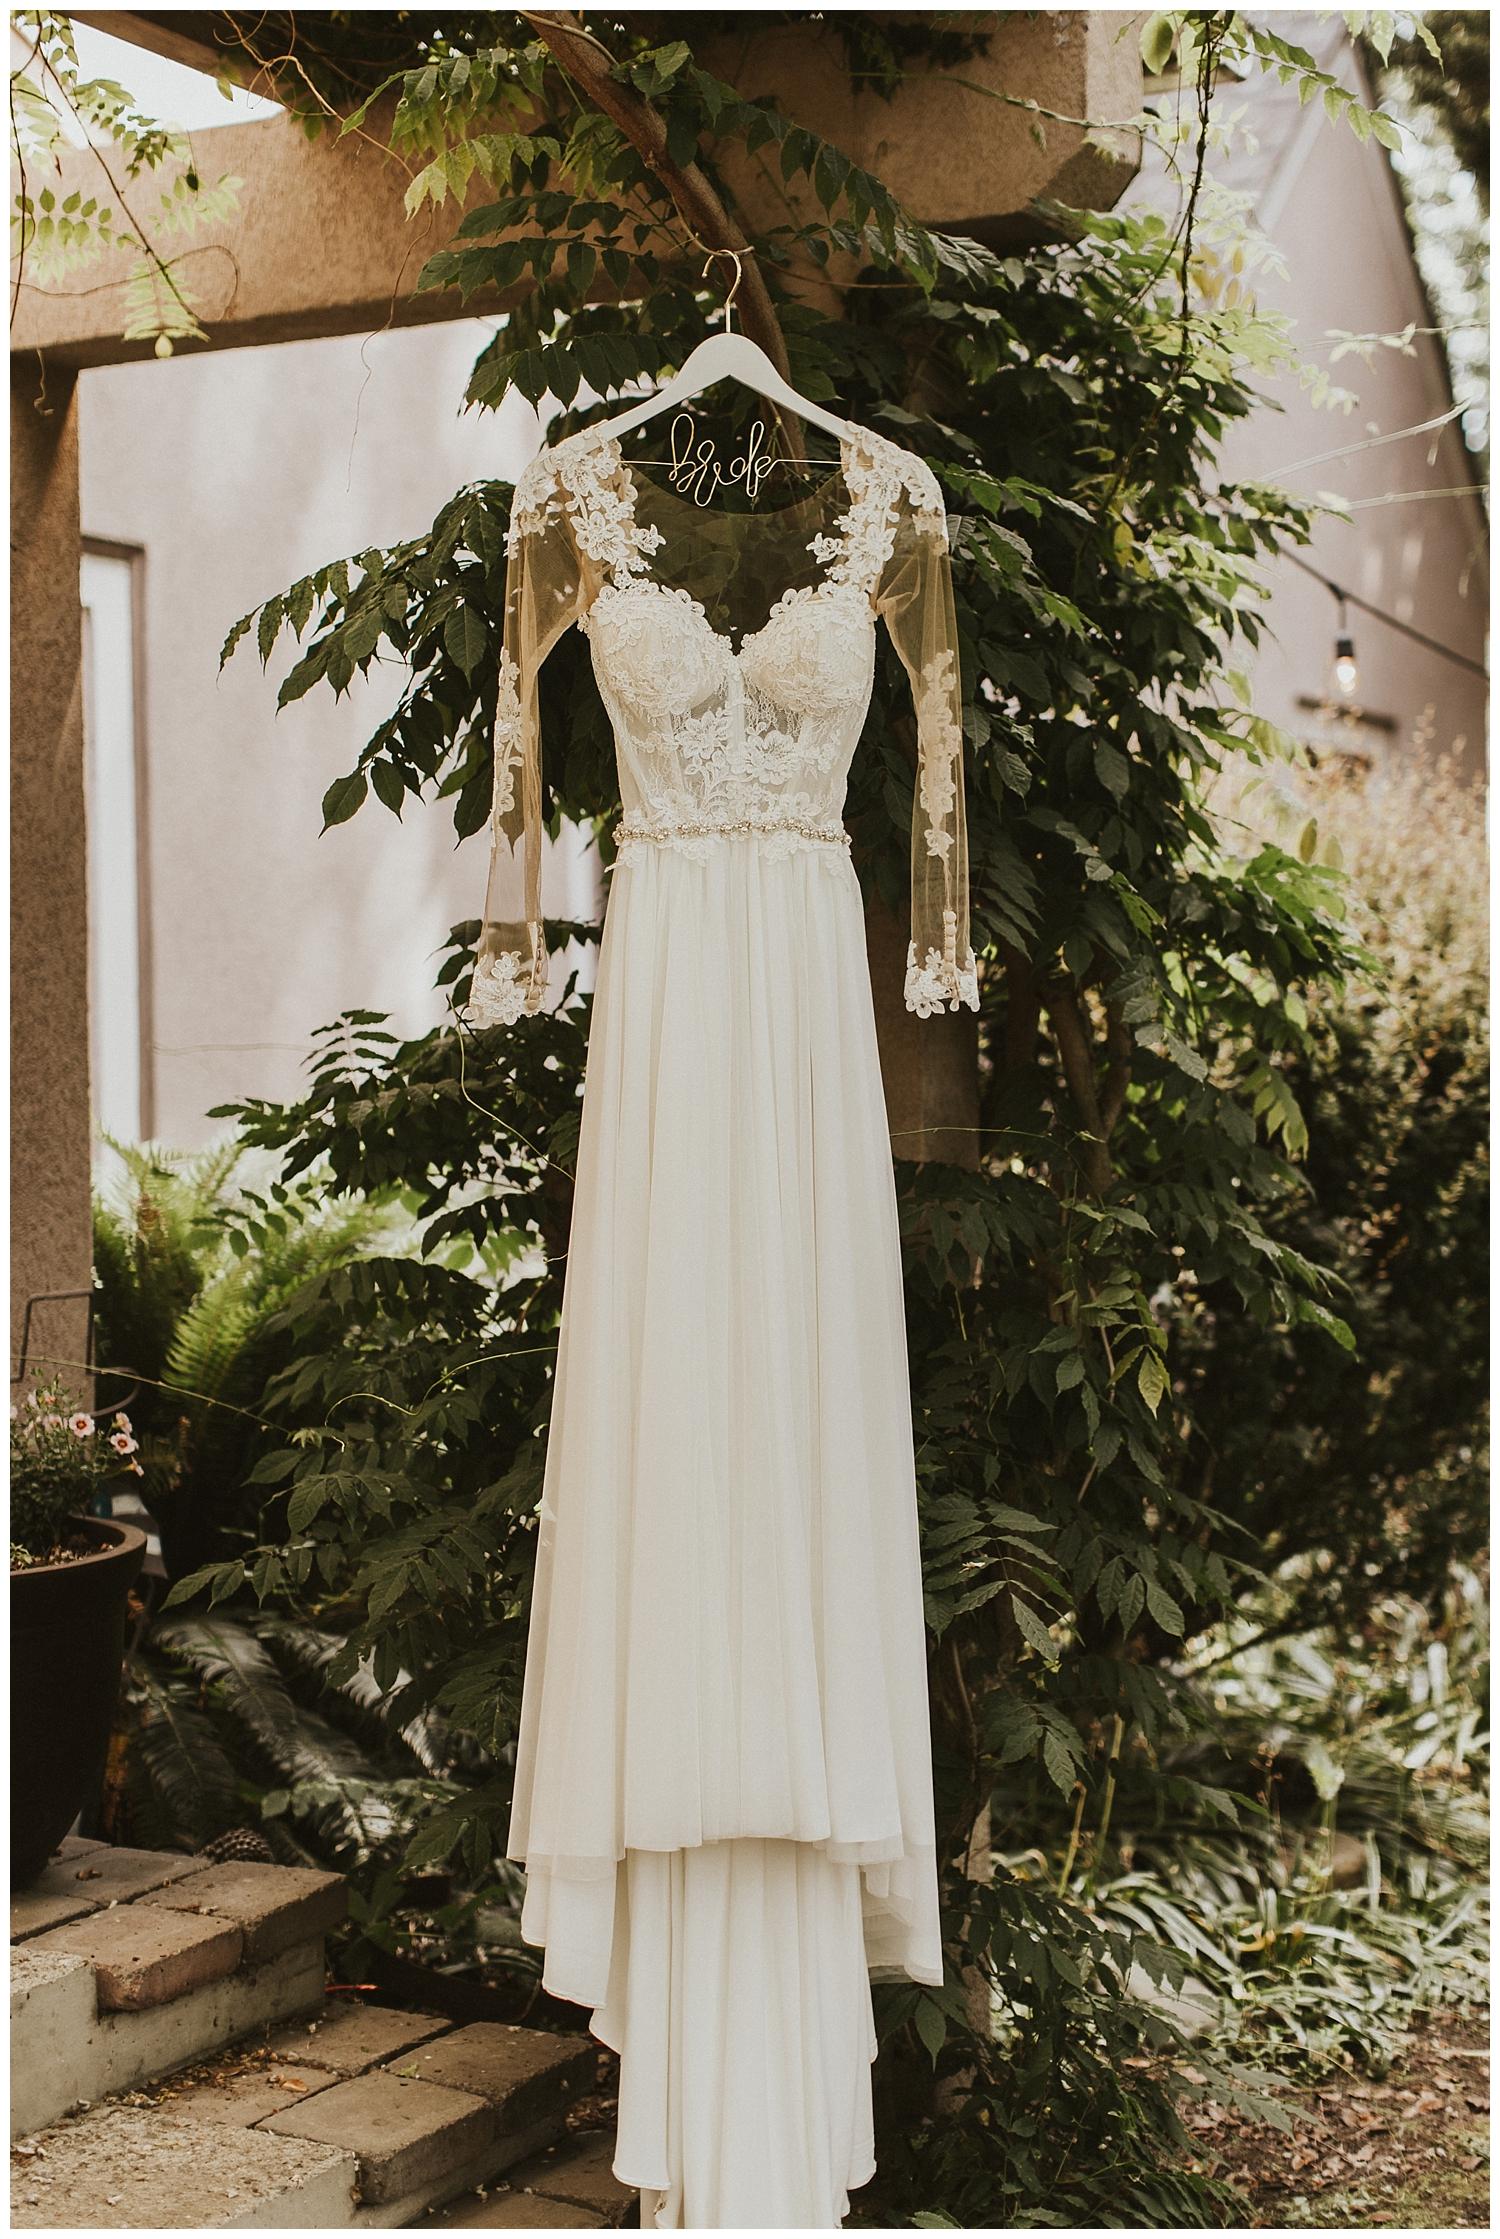 Christinna's Bridal Seattle Wedding Dress